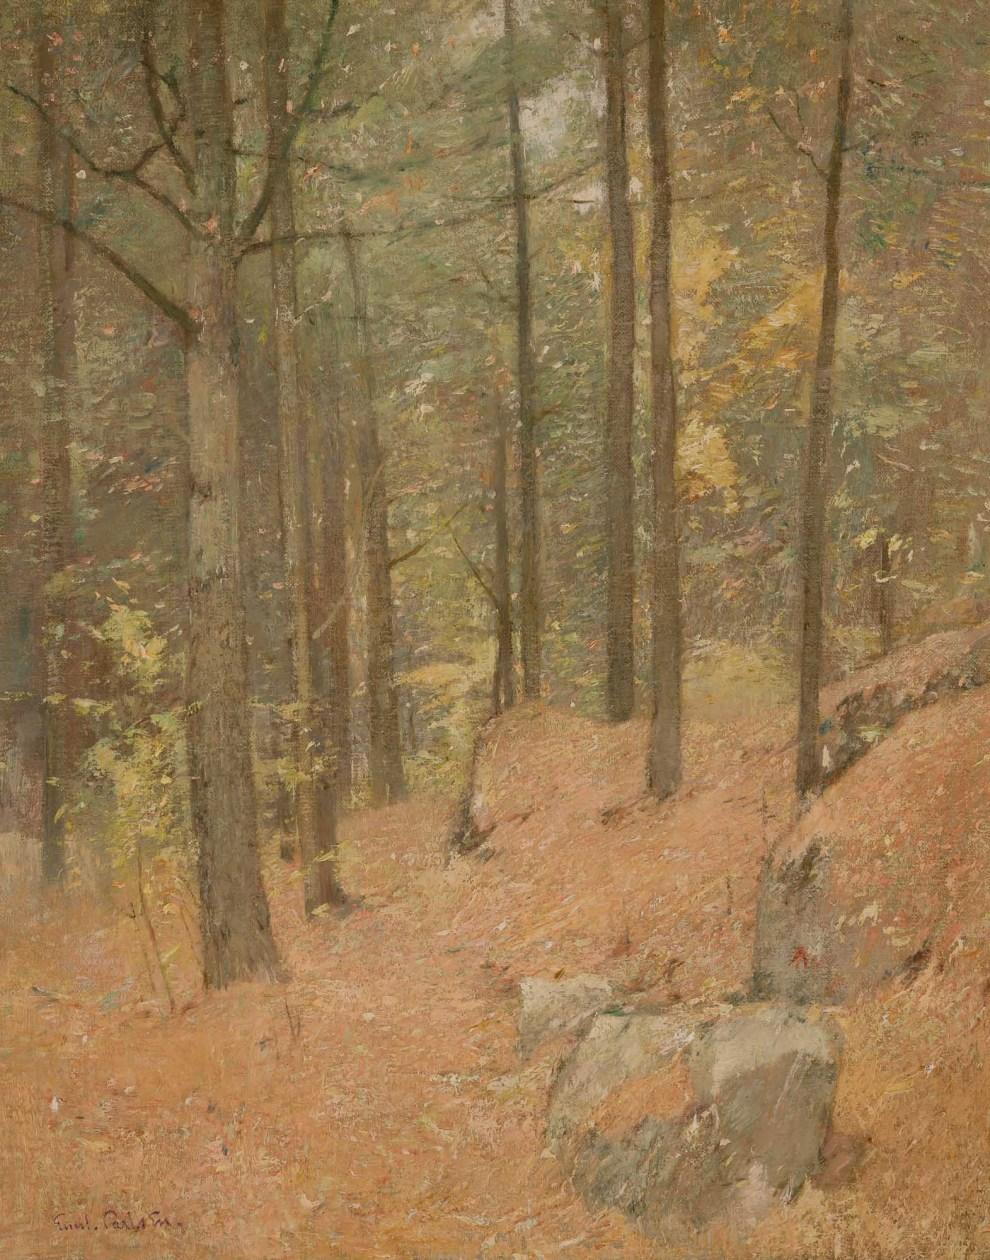 Emil Carlsen : Woods interior no. 1, 1918.